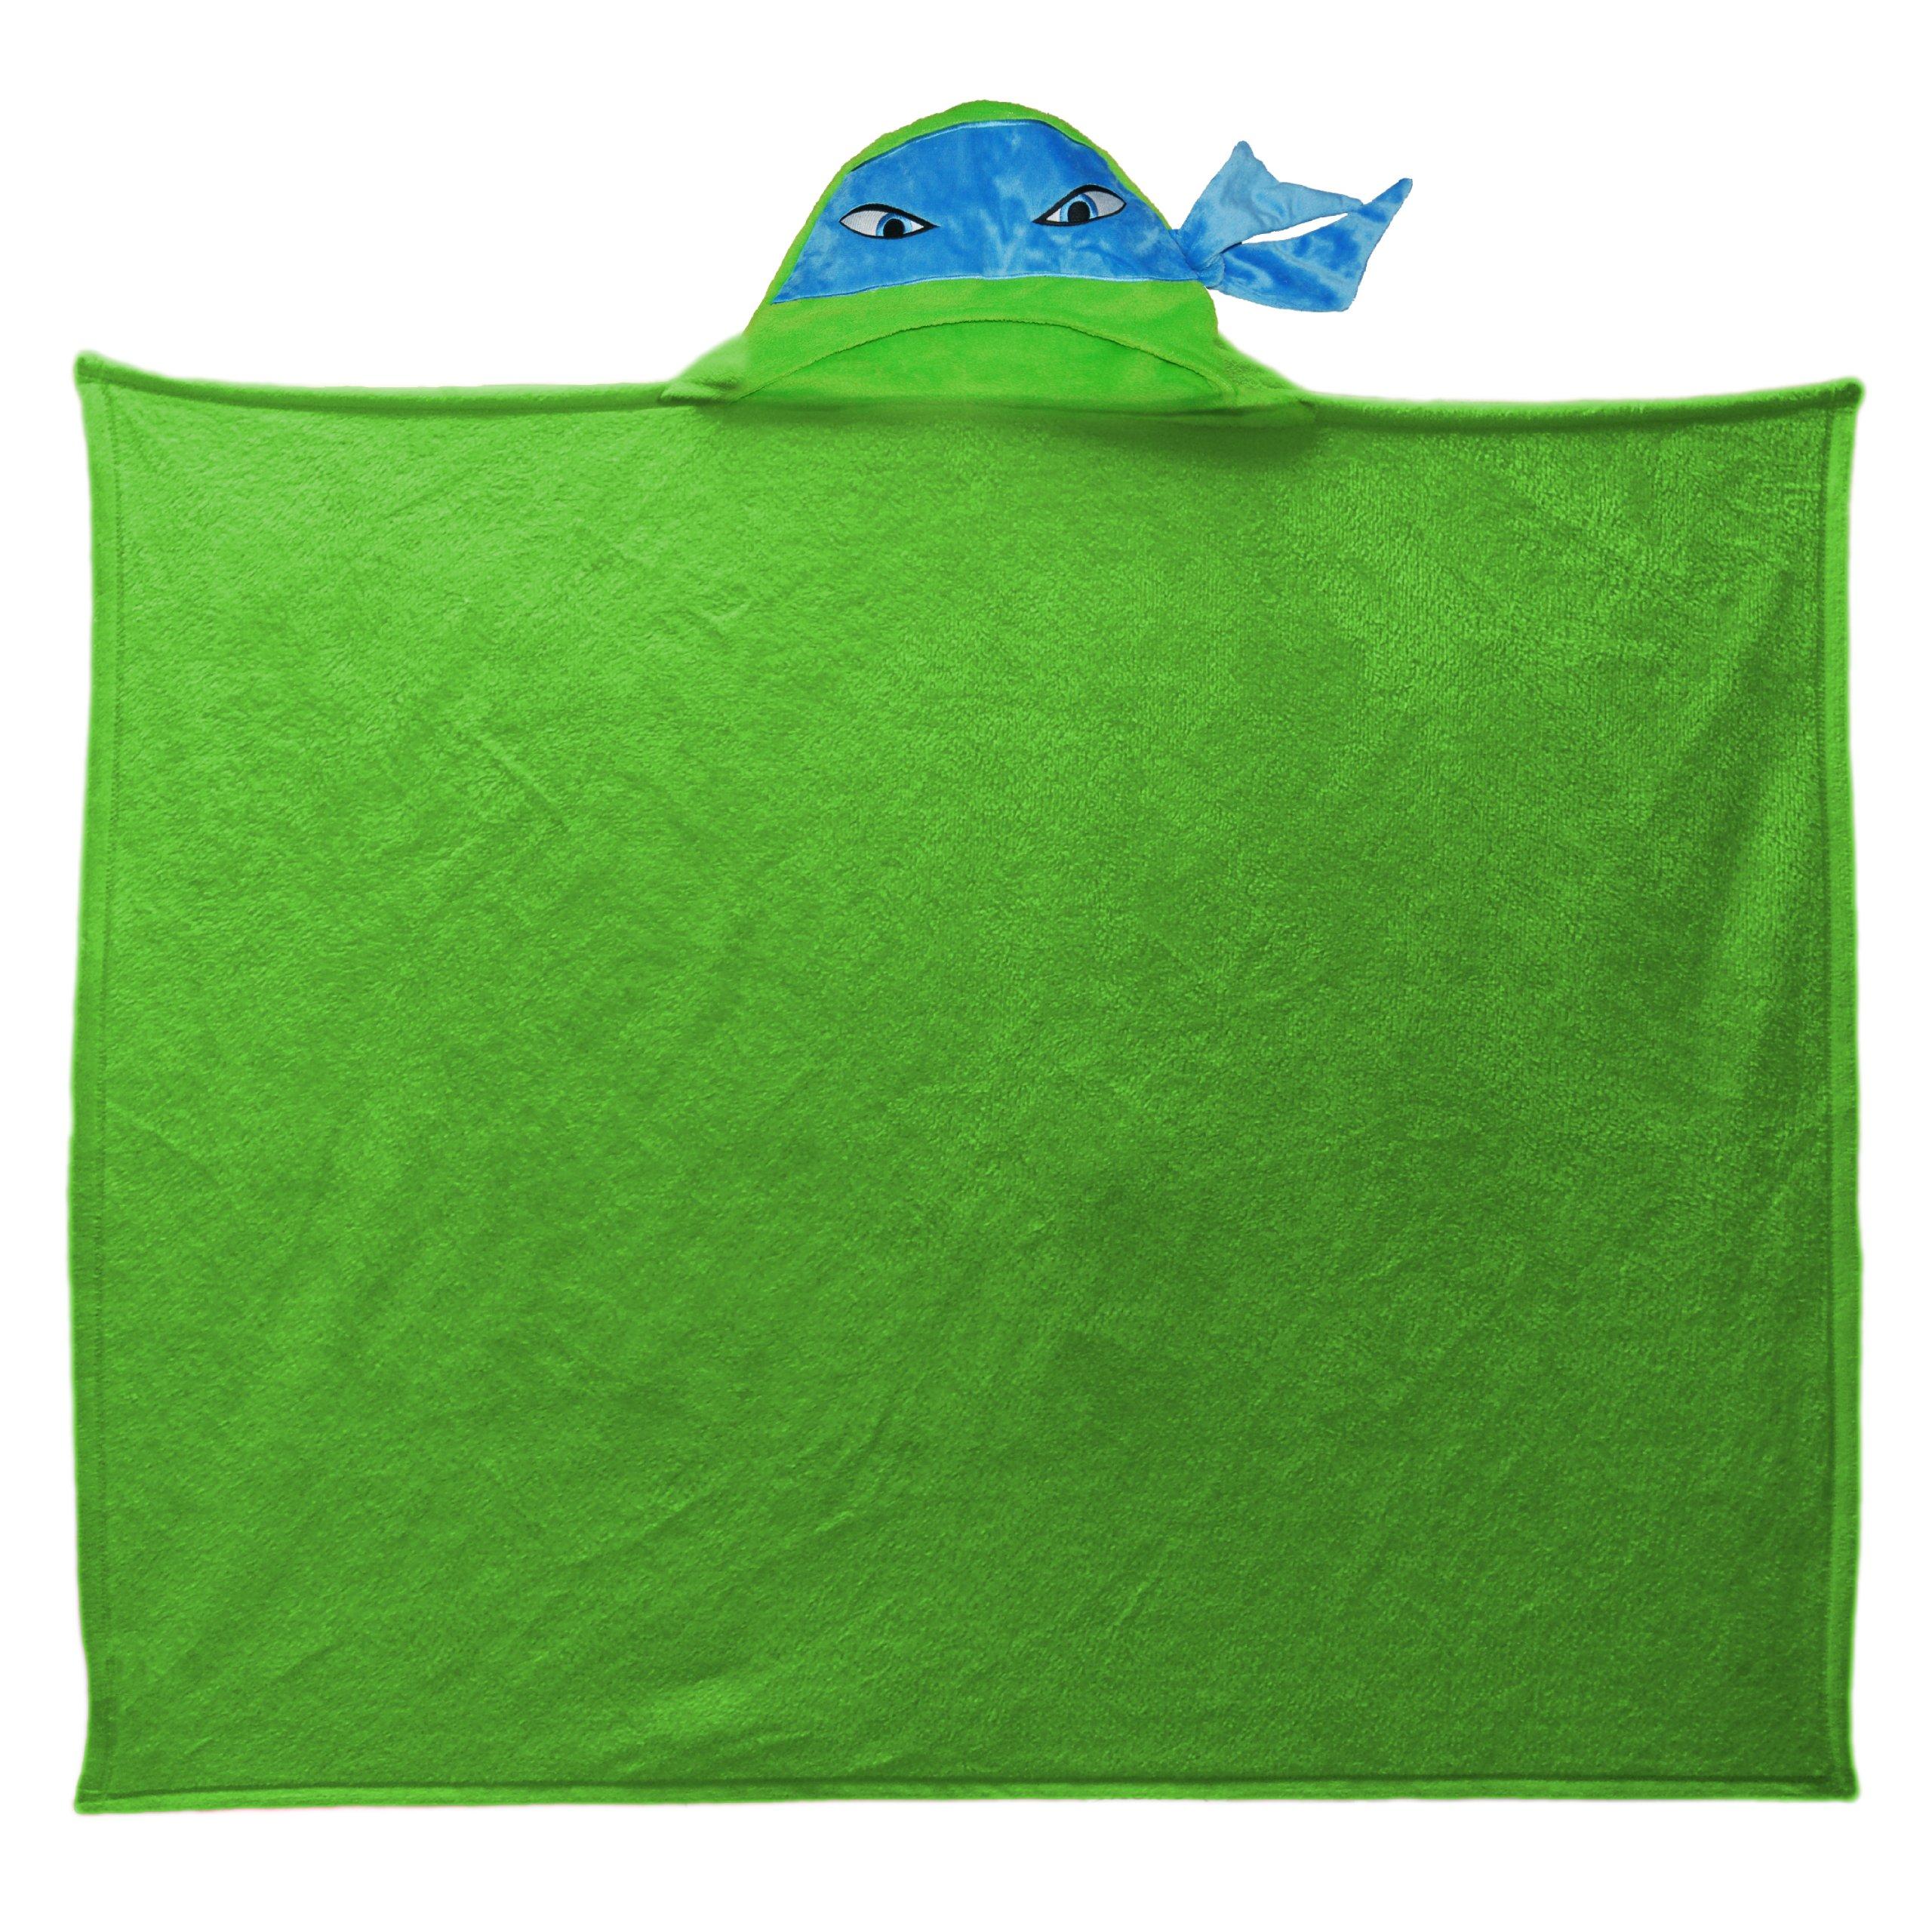 Nickelodeon's Teenage Mutant Ninja Turtles, ''Hooded Ninja'' Hooded Throw Blanket, 40'' x 50'', Multi Color